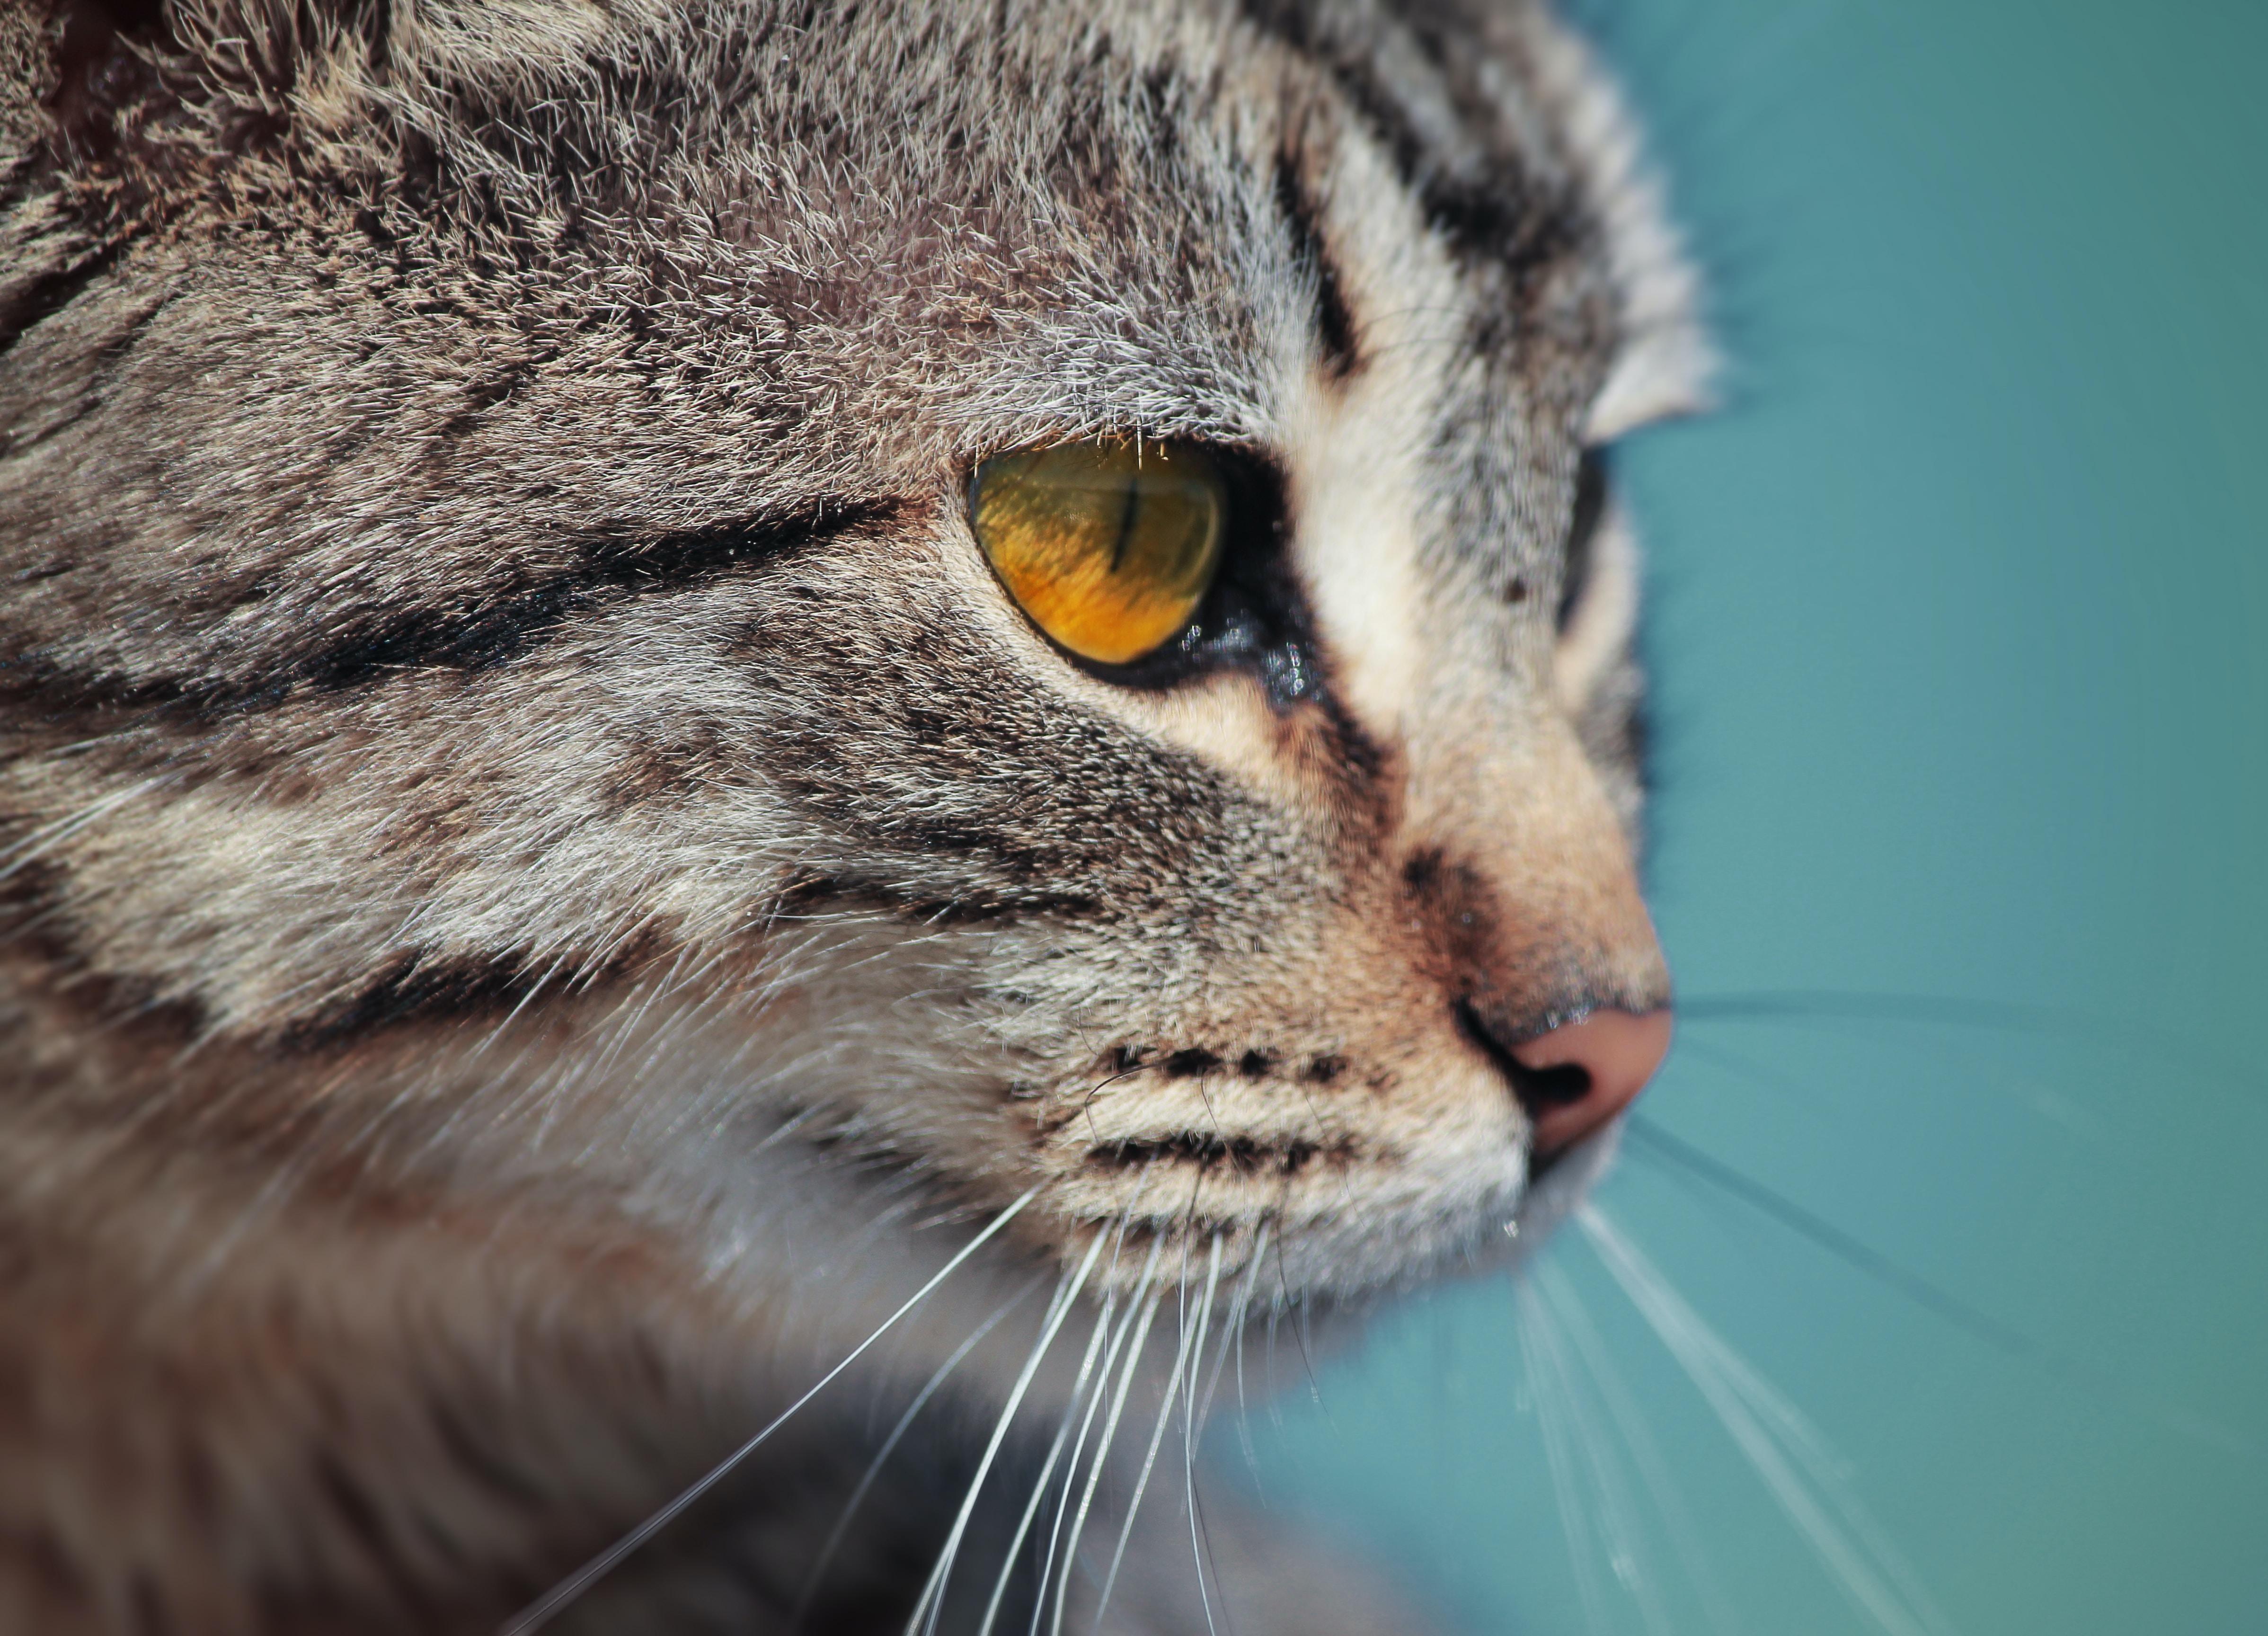 Close-up of a tabby cat's light brown eye